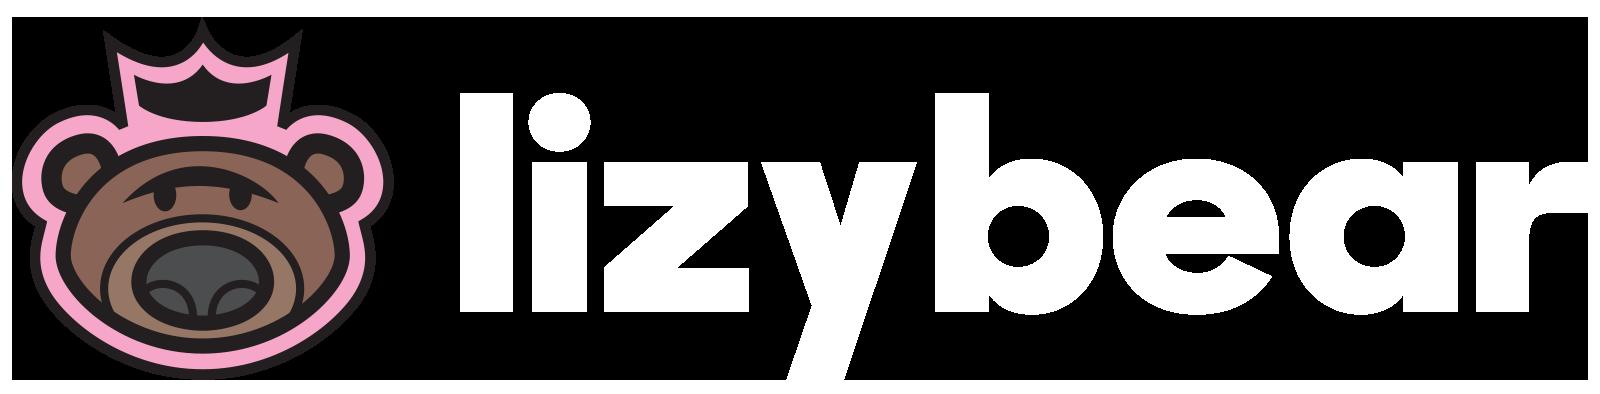 LizyBear